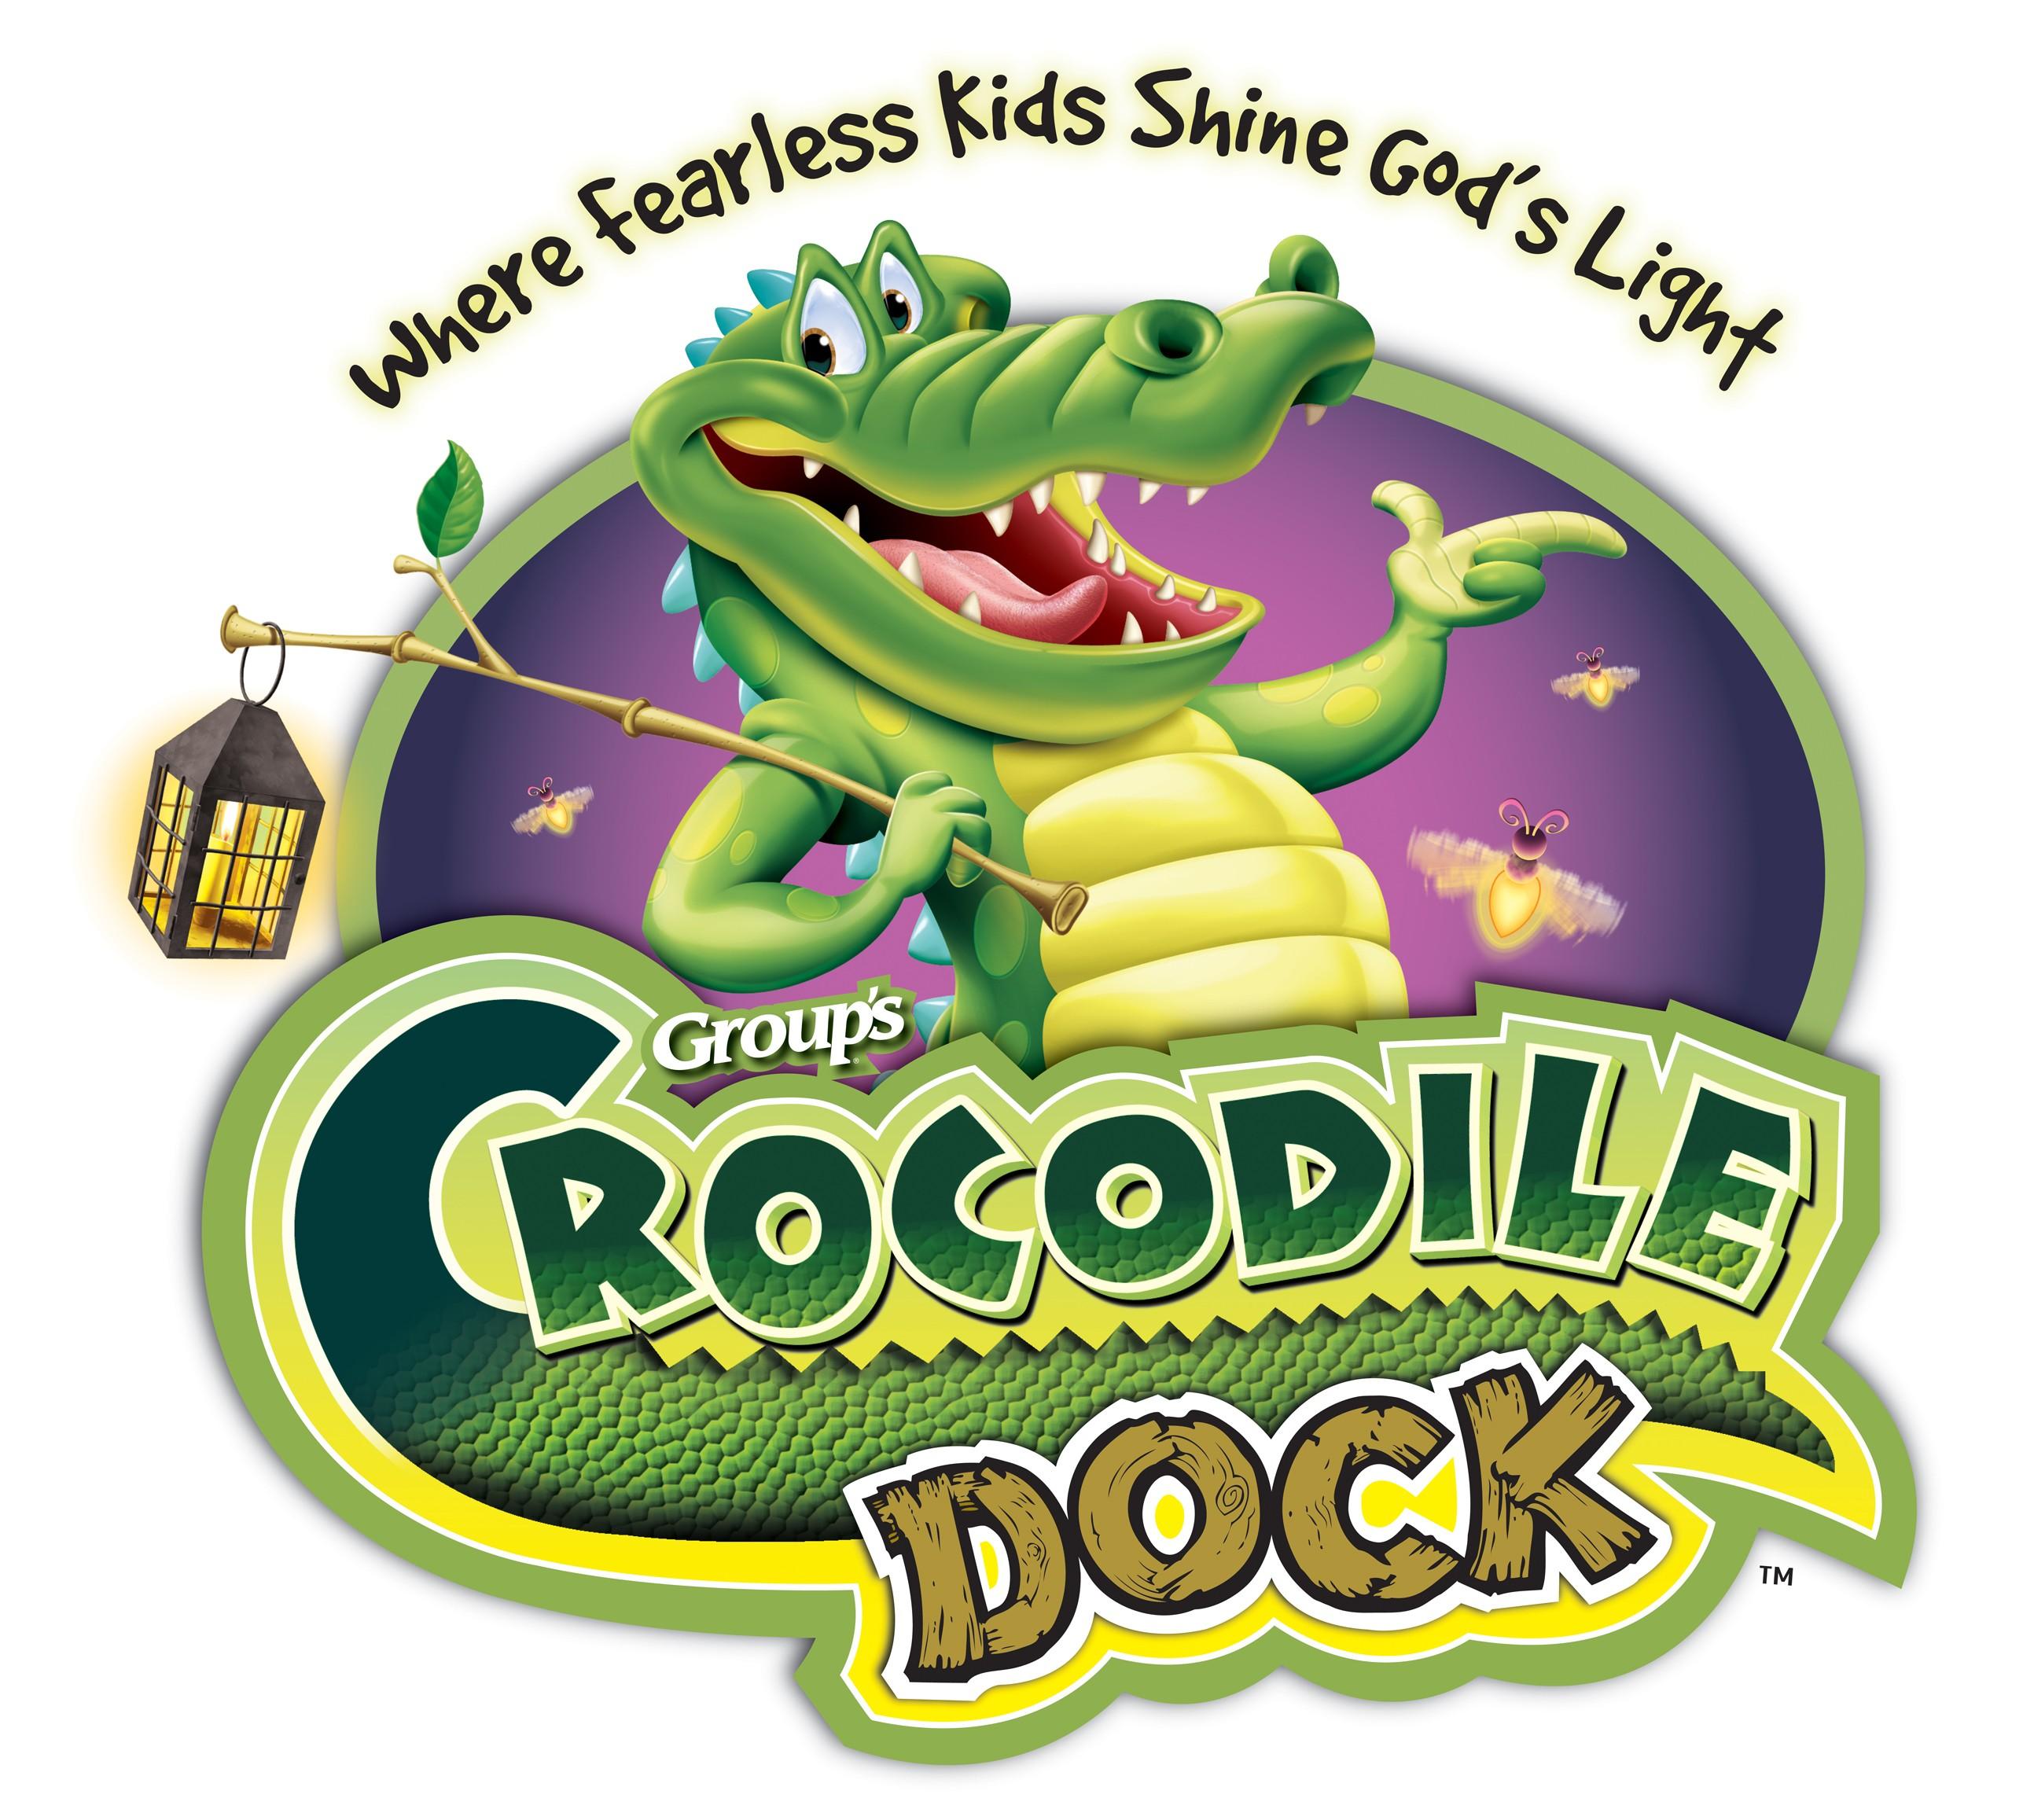 Crocodile Dock Clipart.